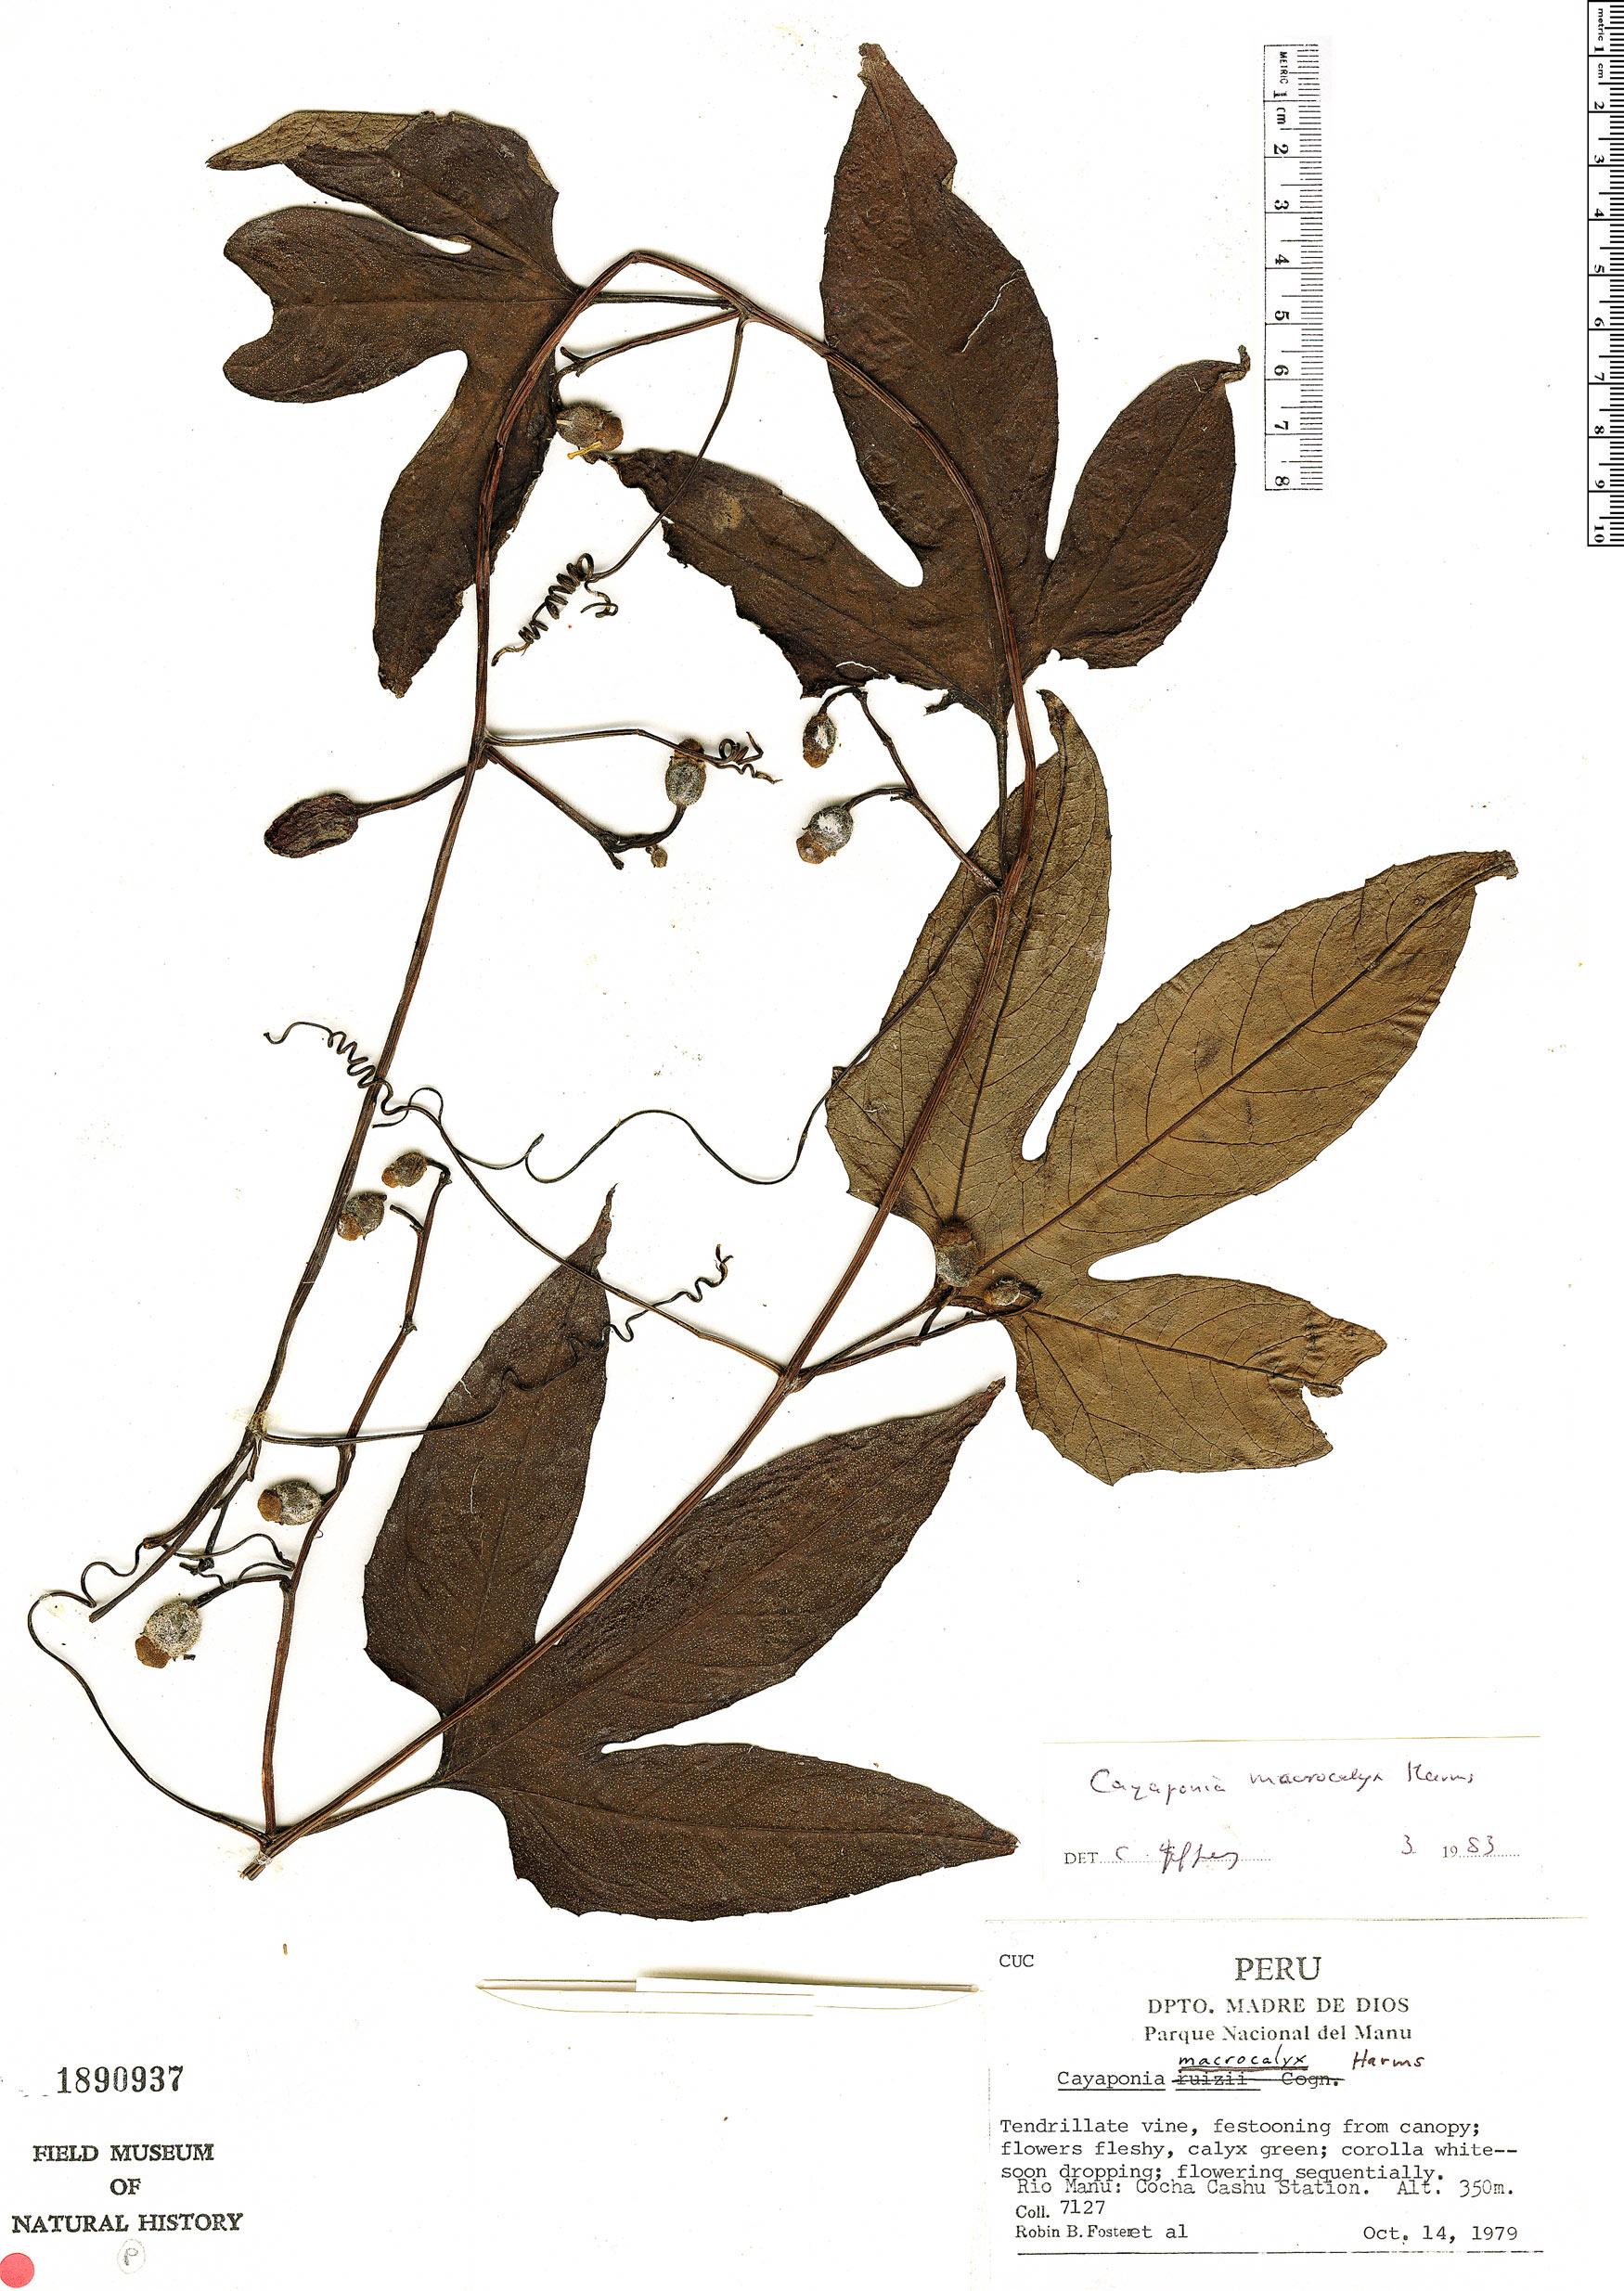 Specimen: Cayaponia peruviana